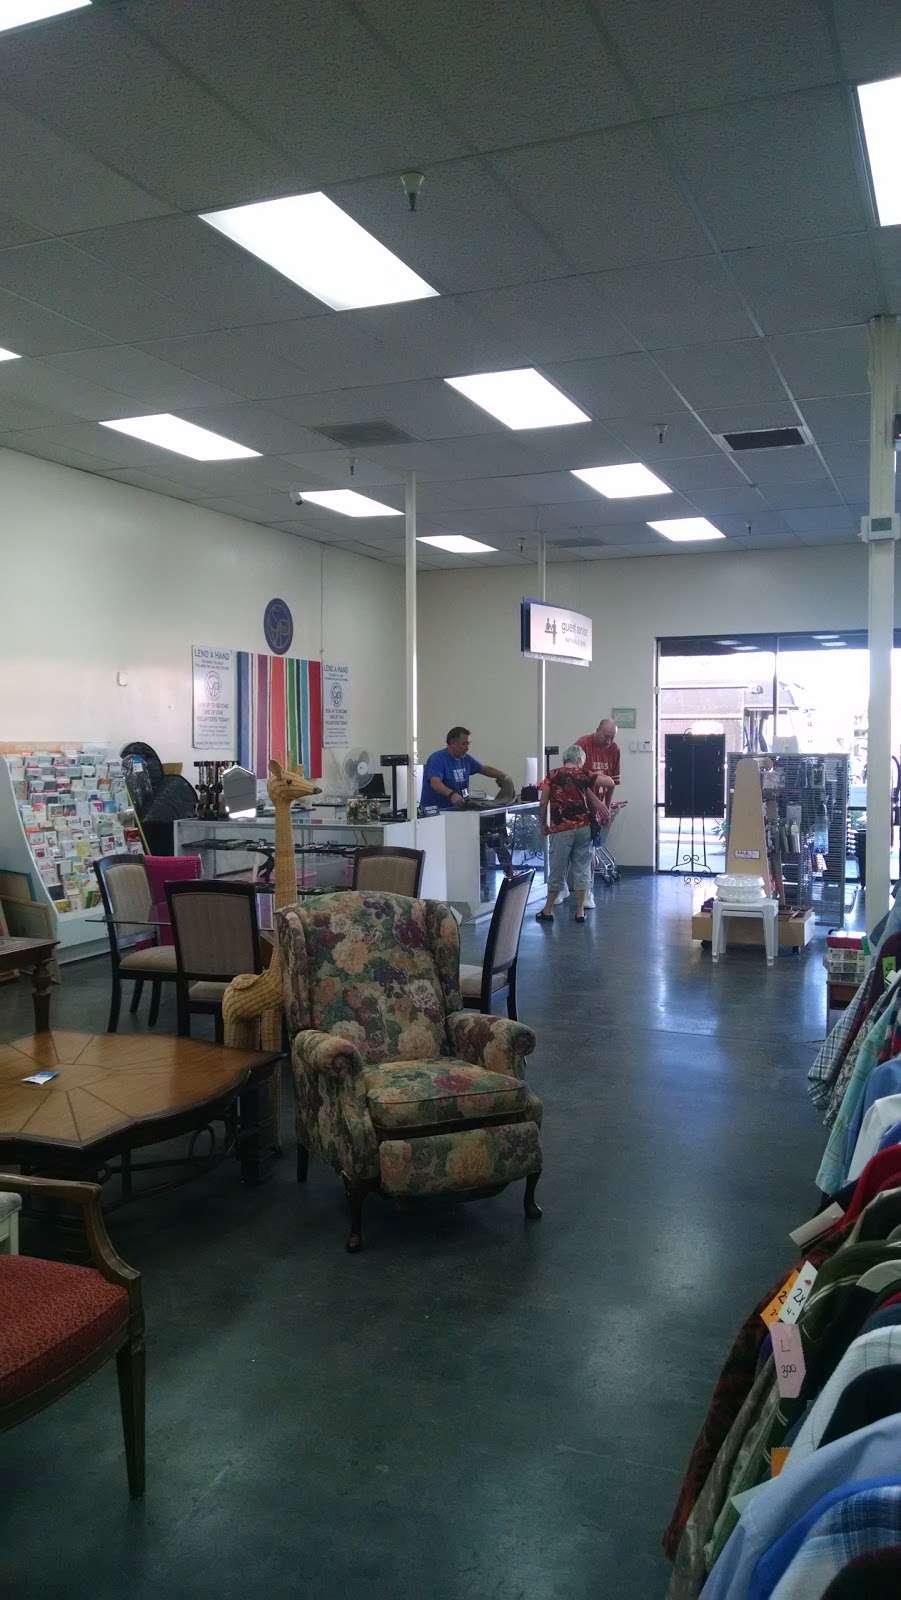 Society of St. Vincent de Paul - Chandler Thrift Store - book store  | Photo 6 of 10 | Address: 963 W Elliot Rd, Chandler, AZ 85225, USA | Phone: (480) 812-1156